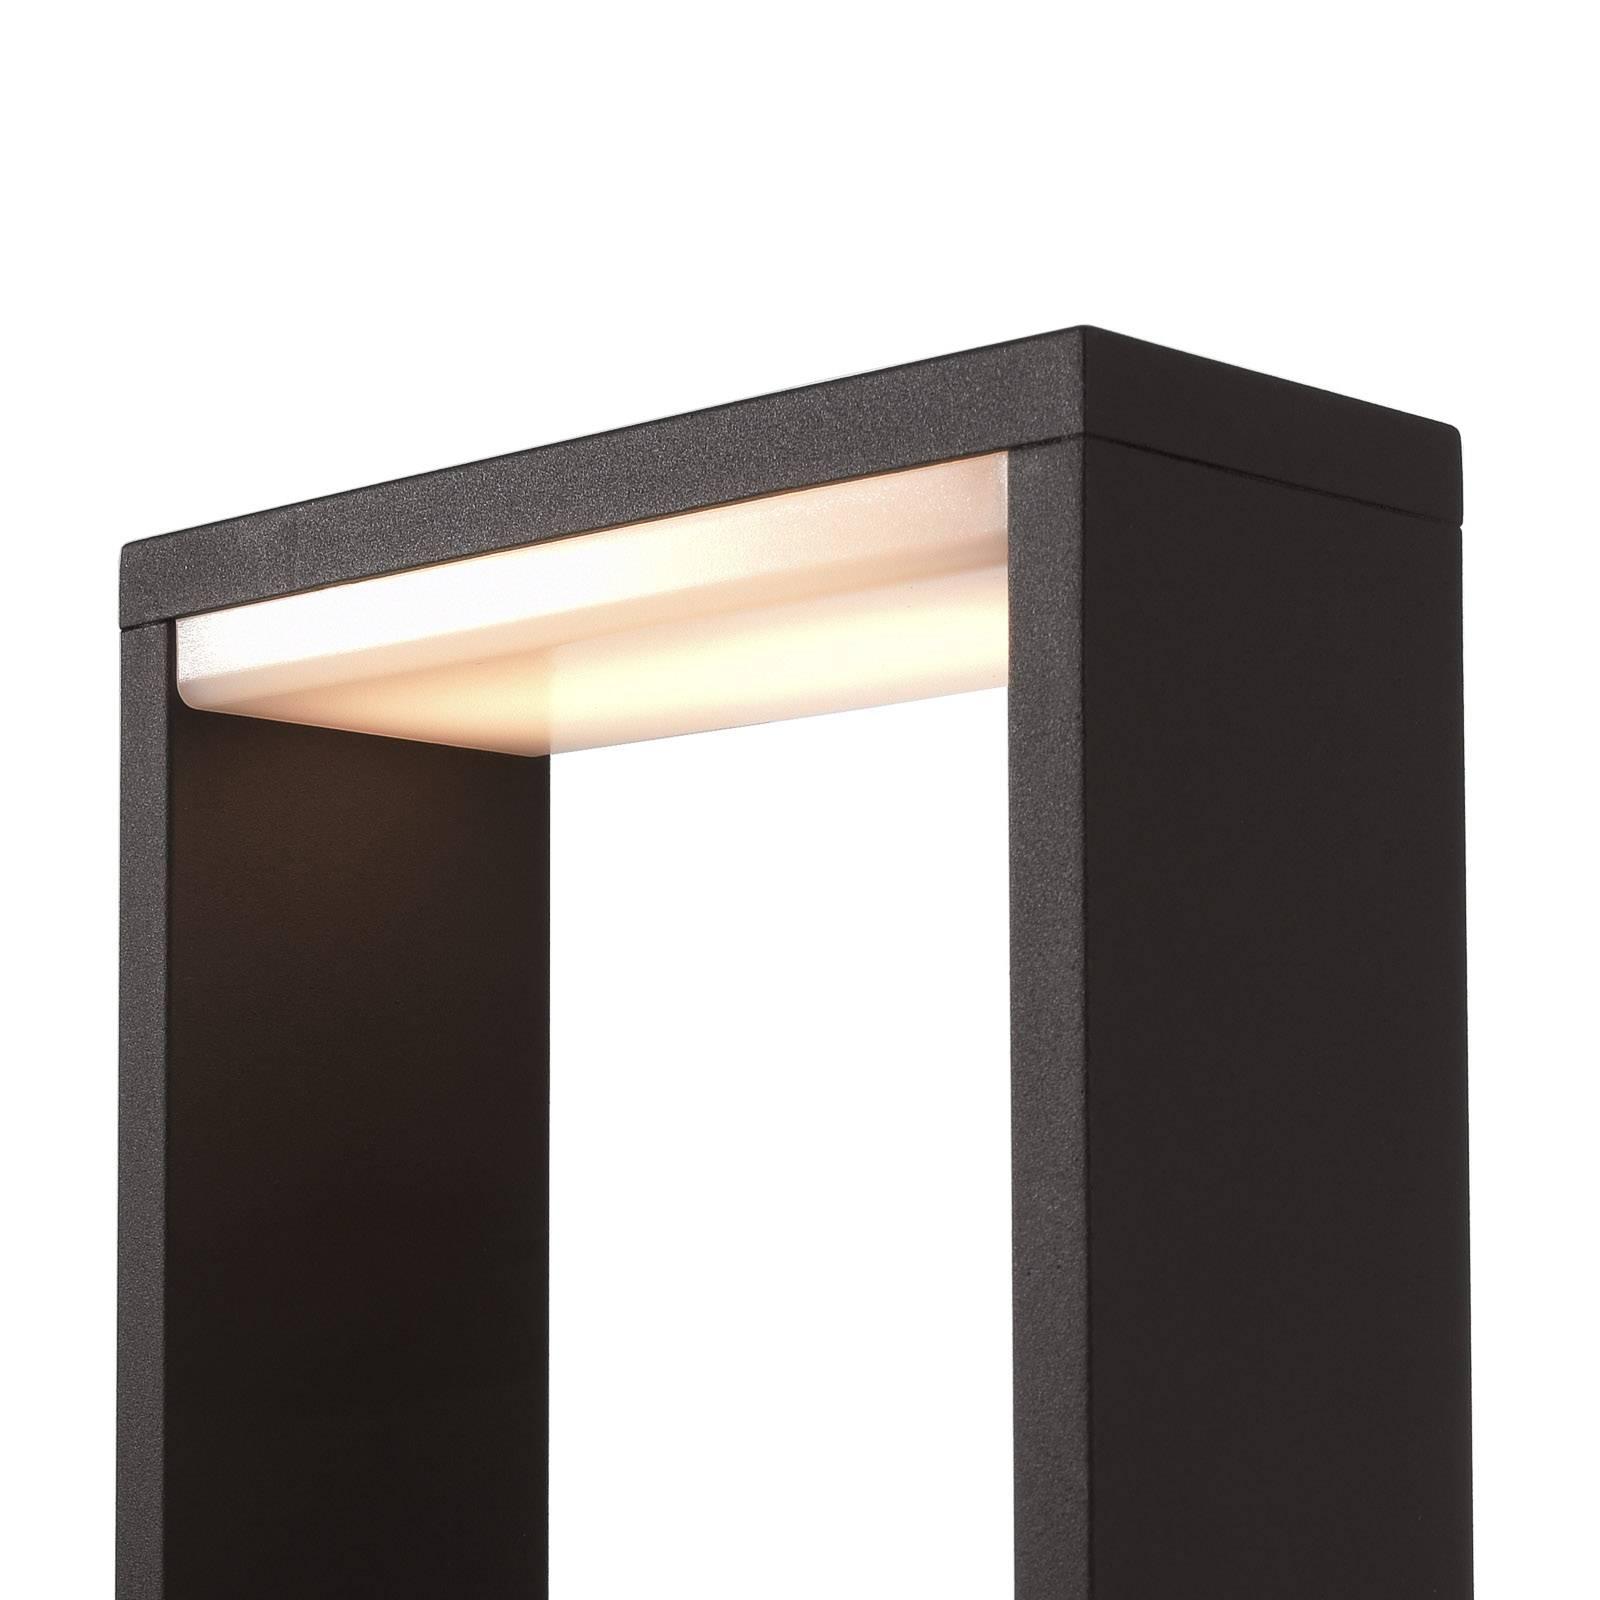 LED-pylväsvalaisin Cata IV, korkeus 70 cm